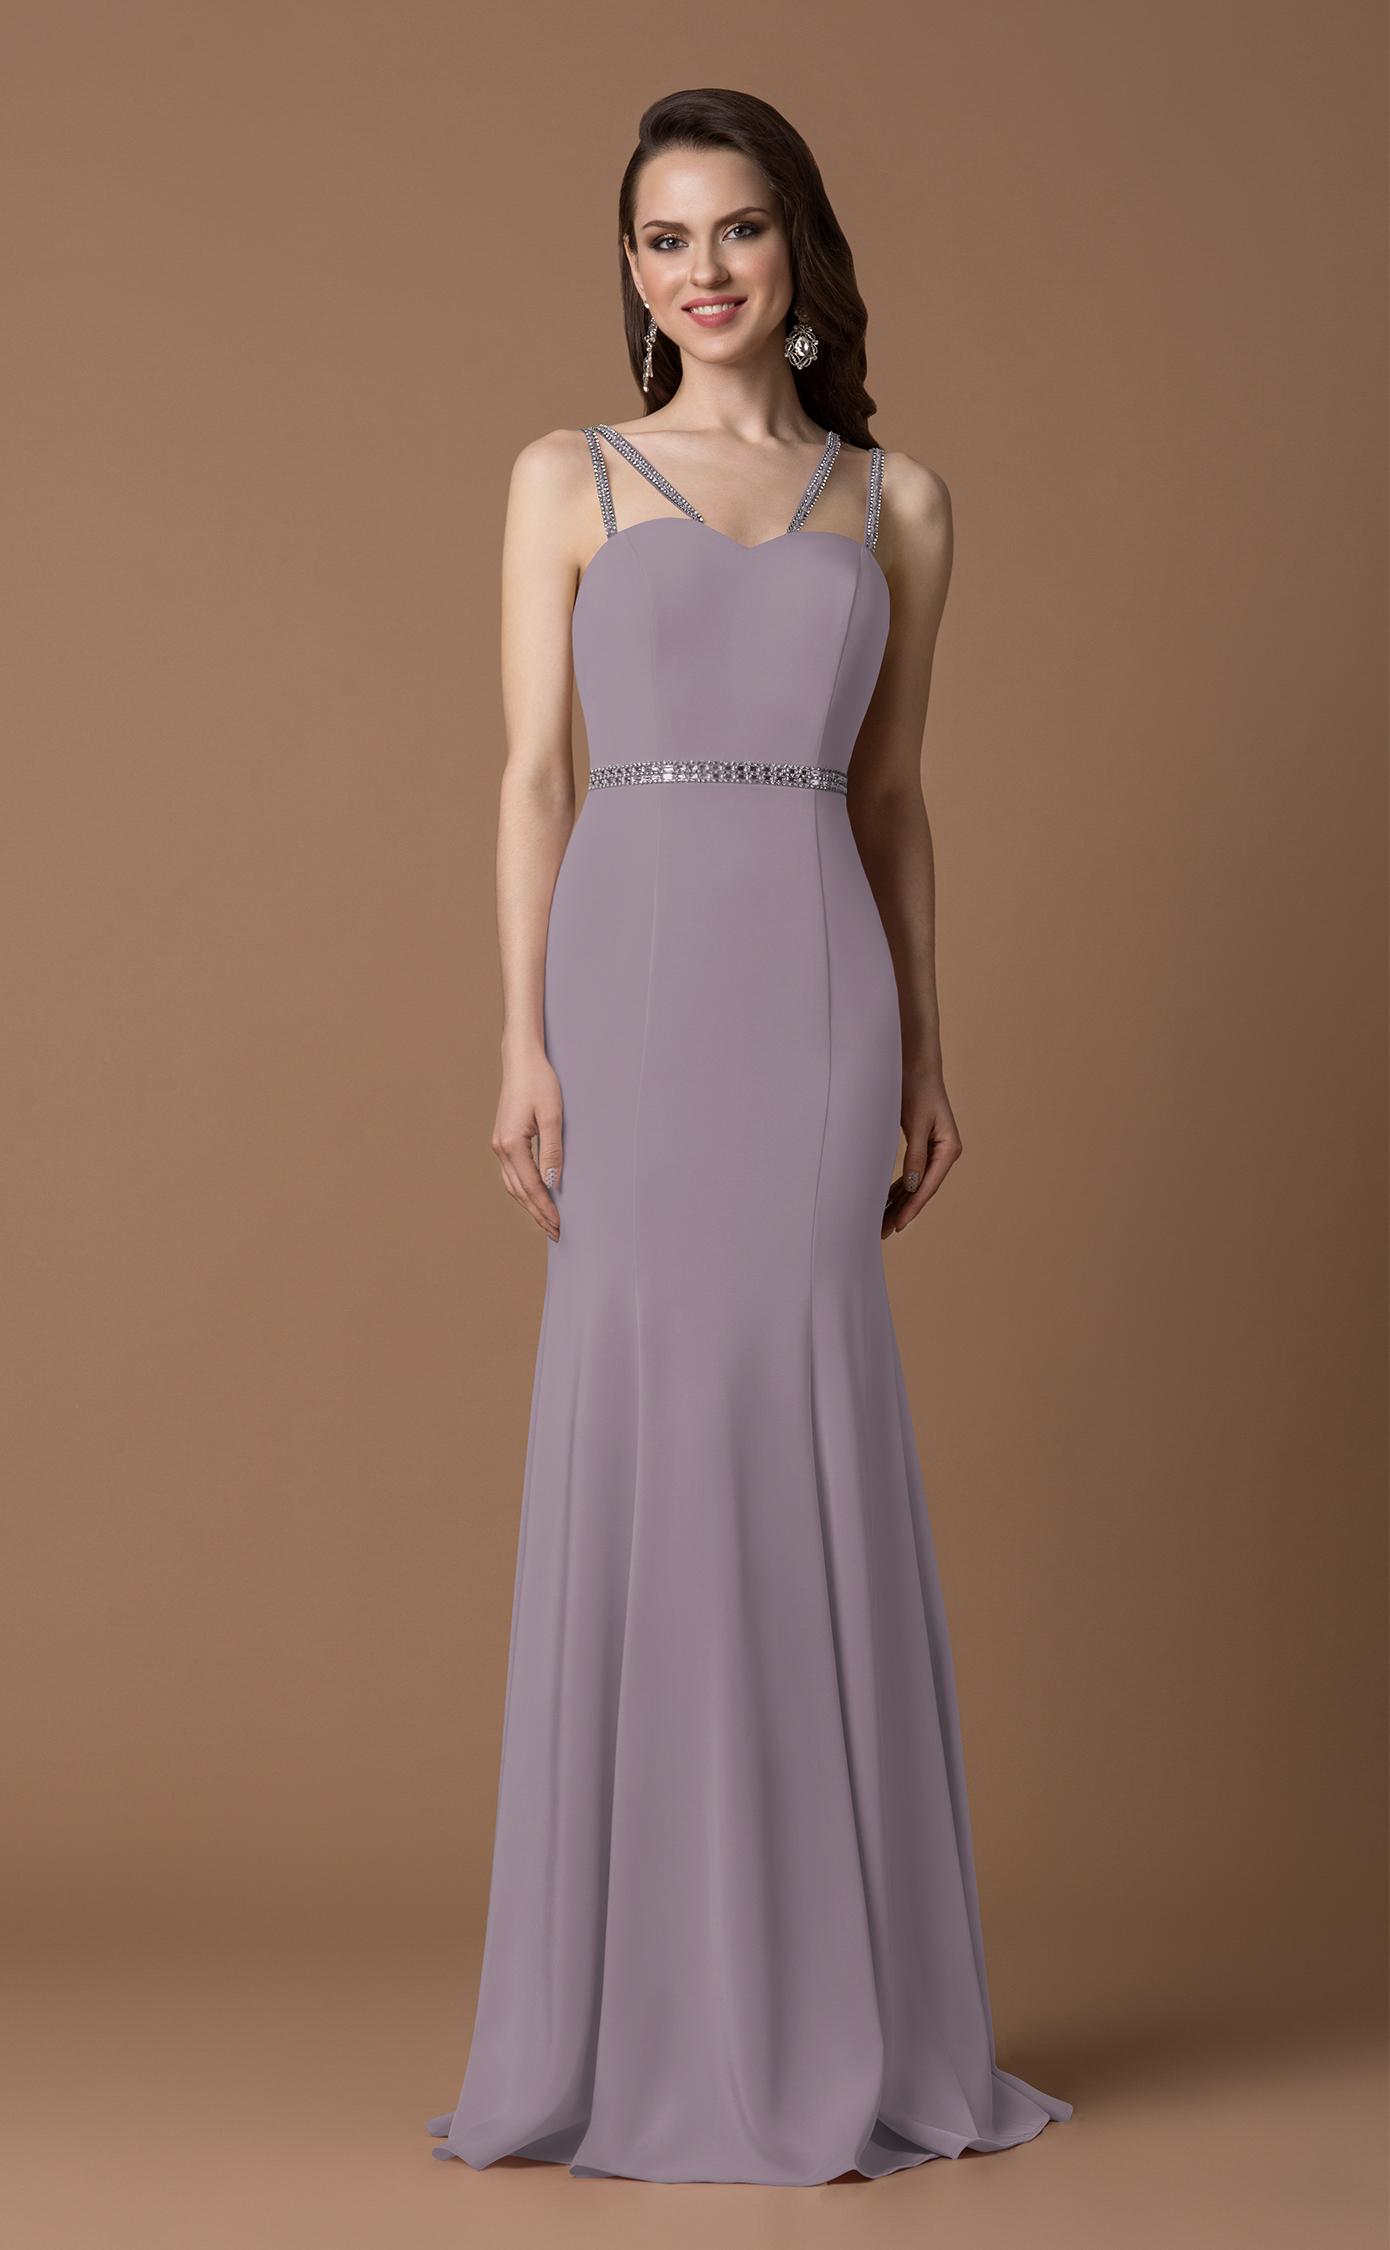 elegantes abendkleid in der farbe silberrosa  samyra fashion